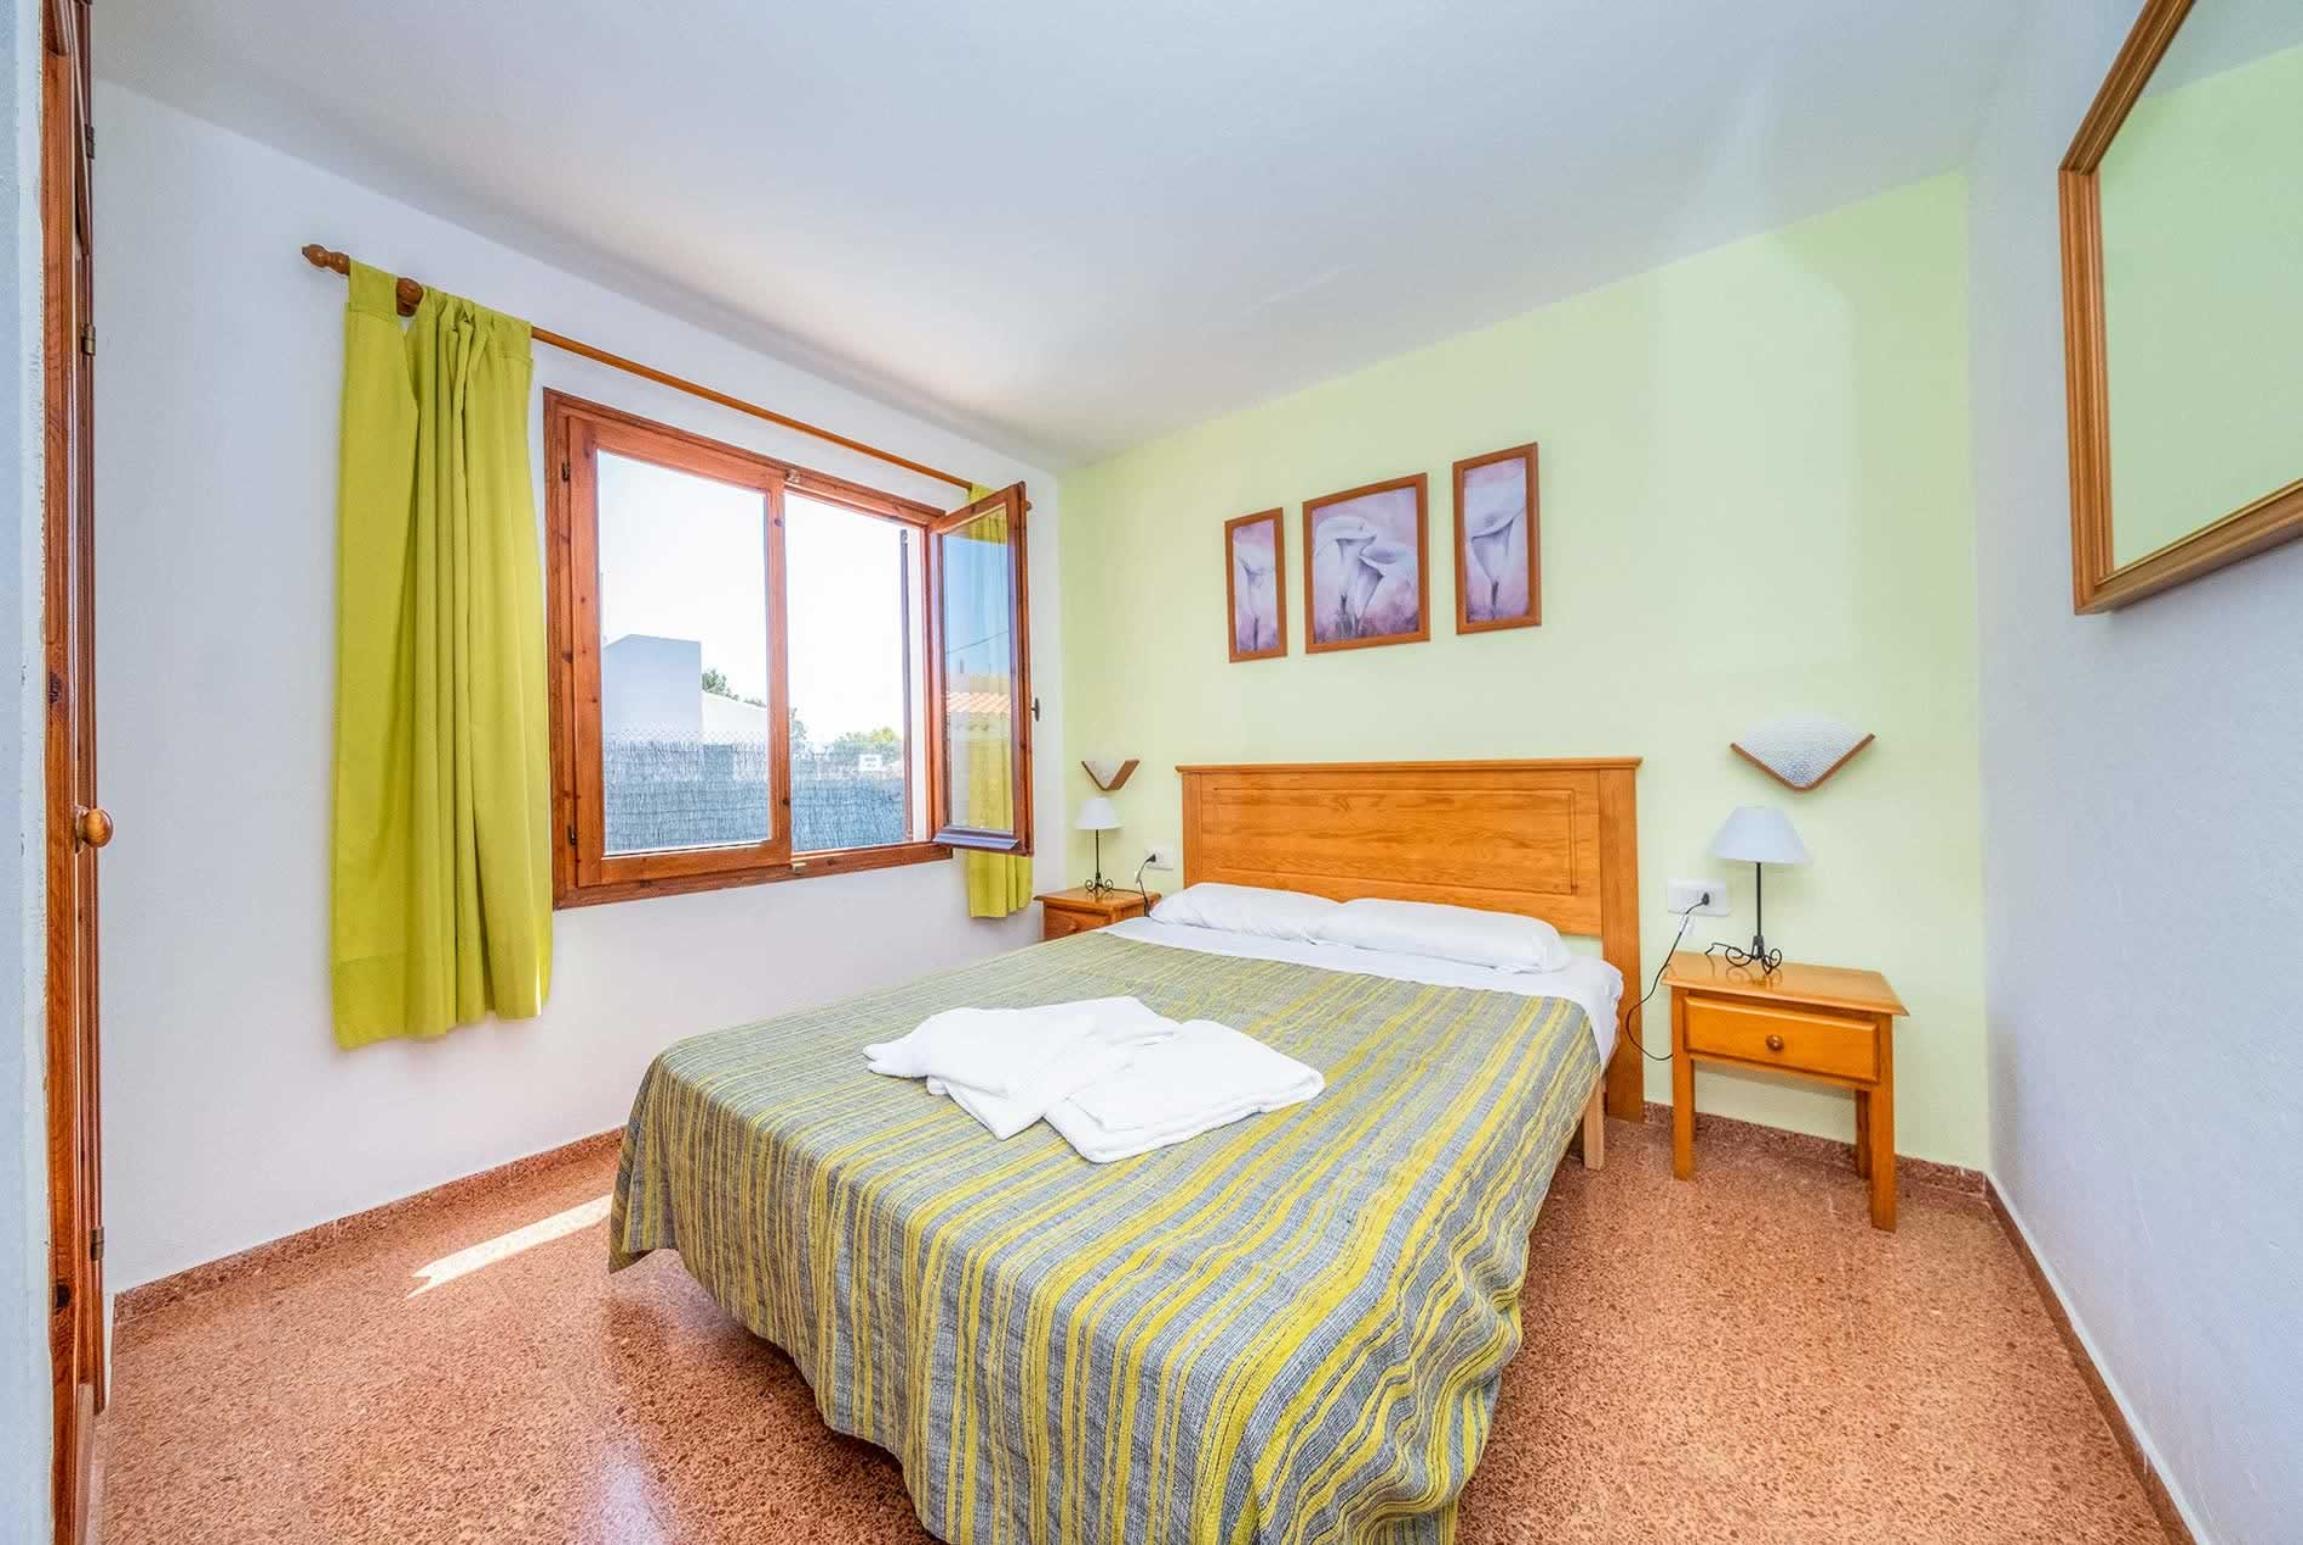 Ferienhaus Iris Prima (2653680), Punta Prima, Menorca, Balearische Inseln, Spanien, Bild 8